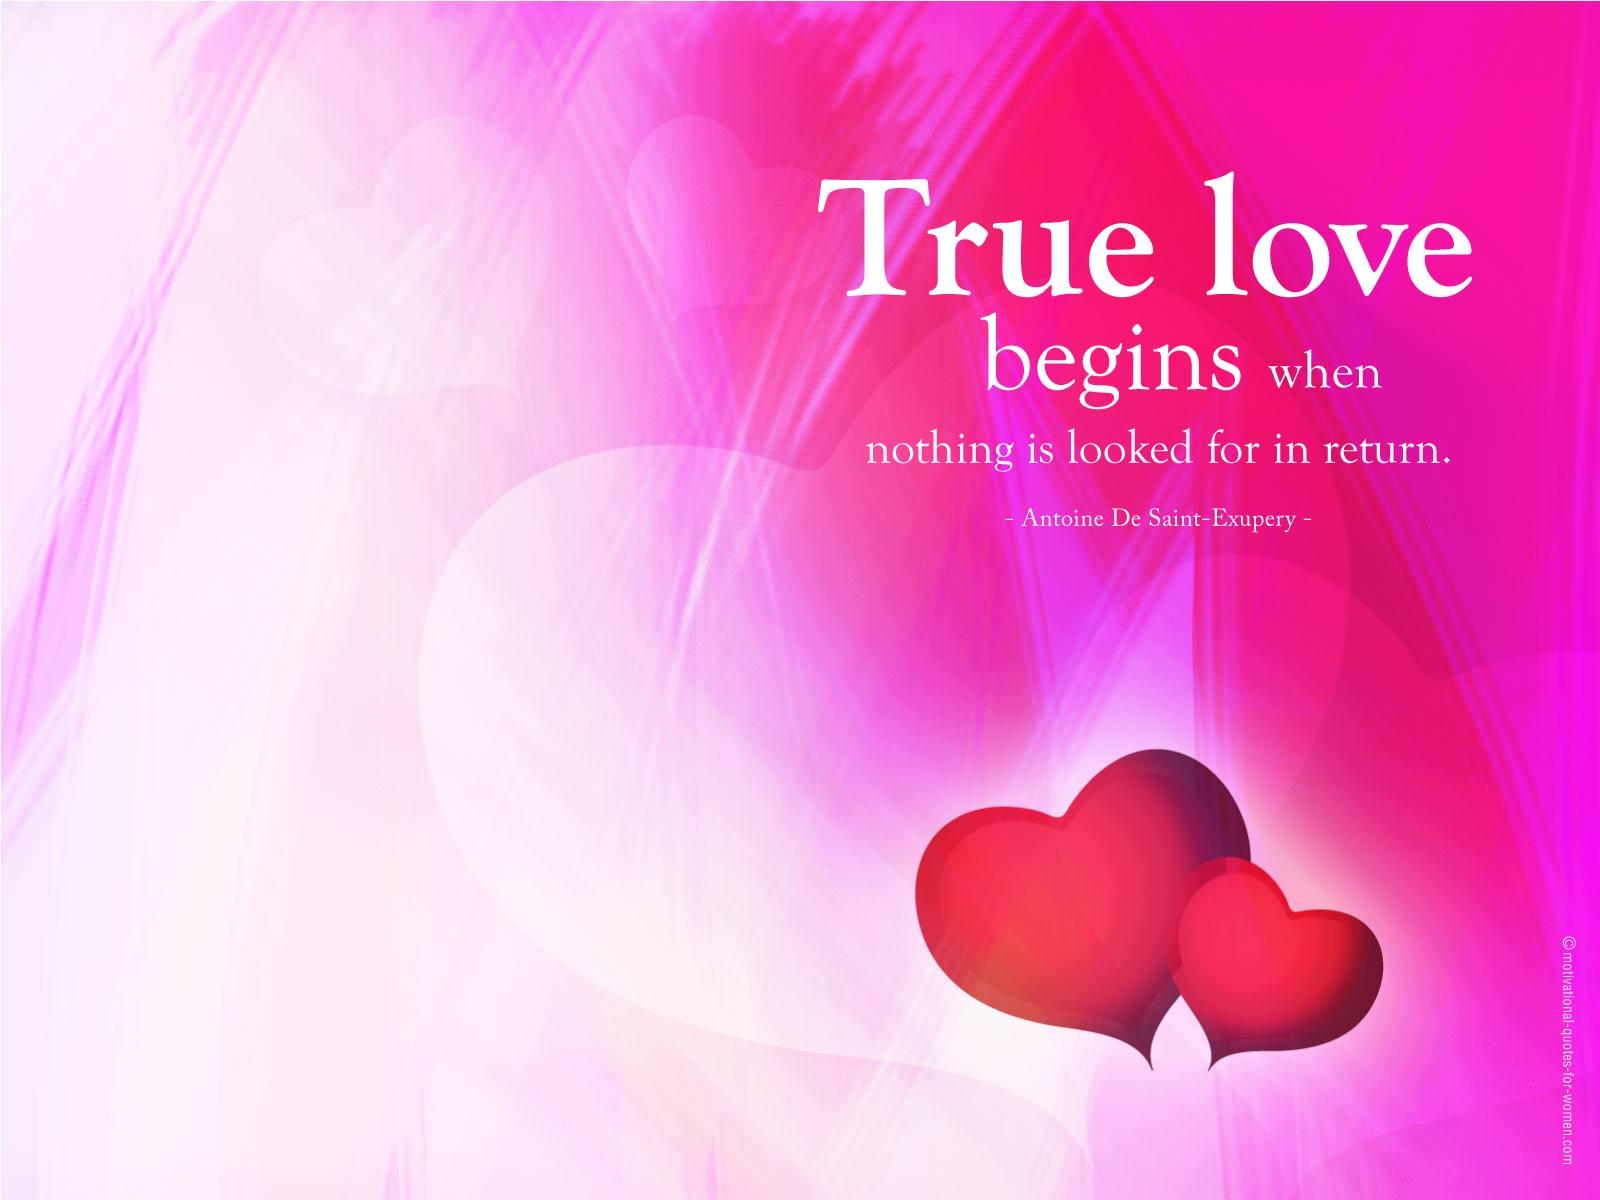 True Love Quotes Wallpaper: Self Motivational Quotes Desktop Wallpapers